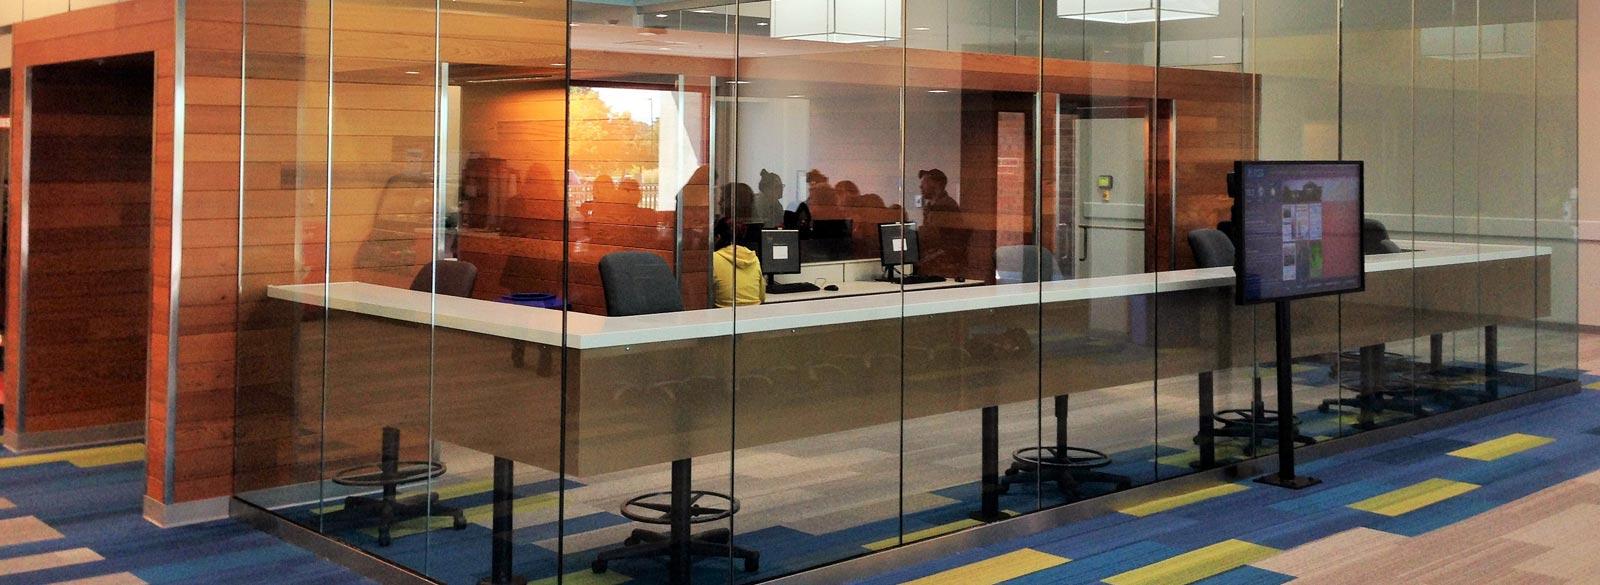 home interior tech seattle portland mid century modern interior designer portland trend home